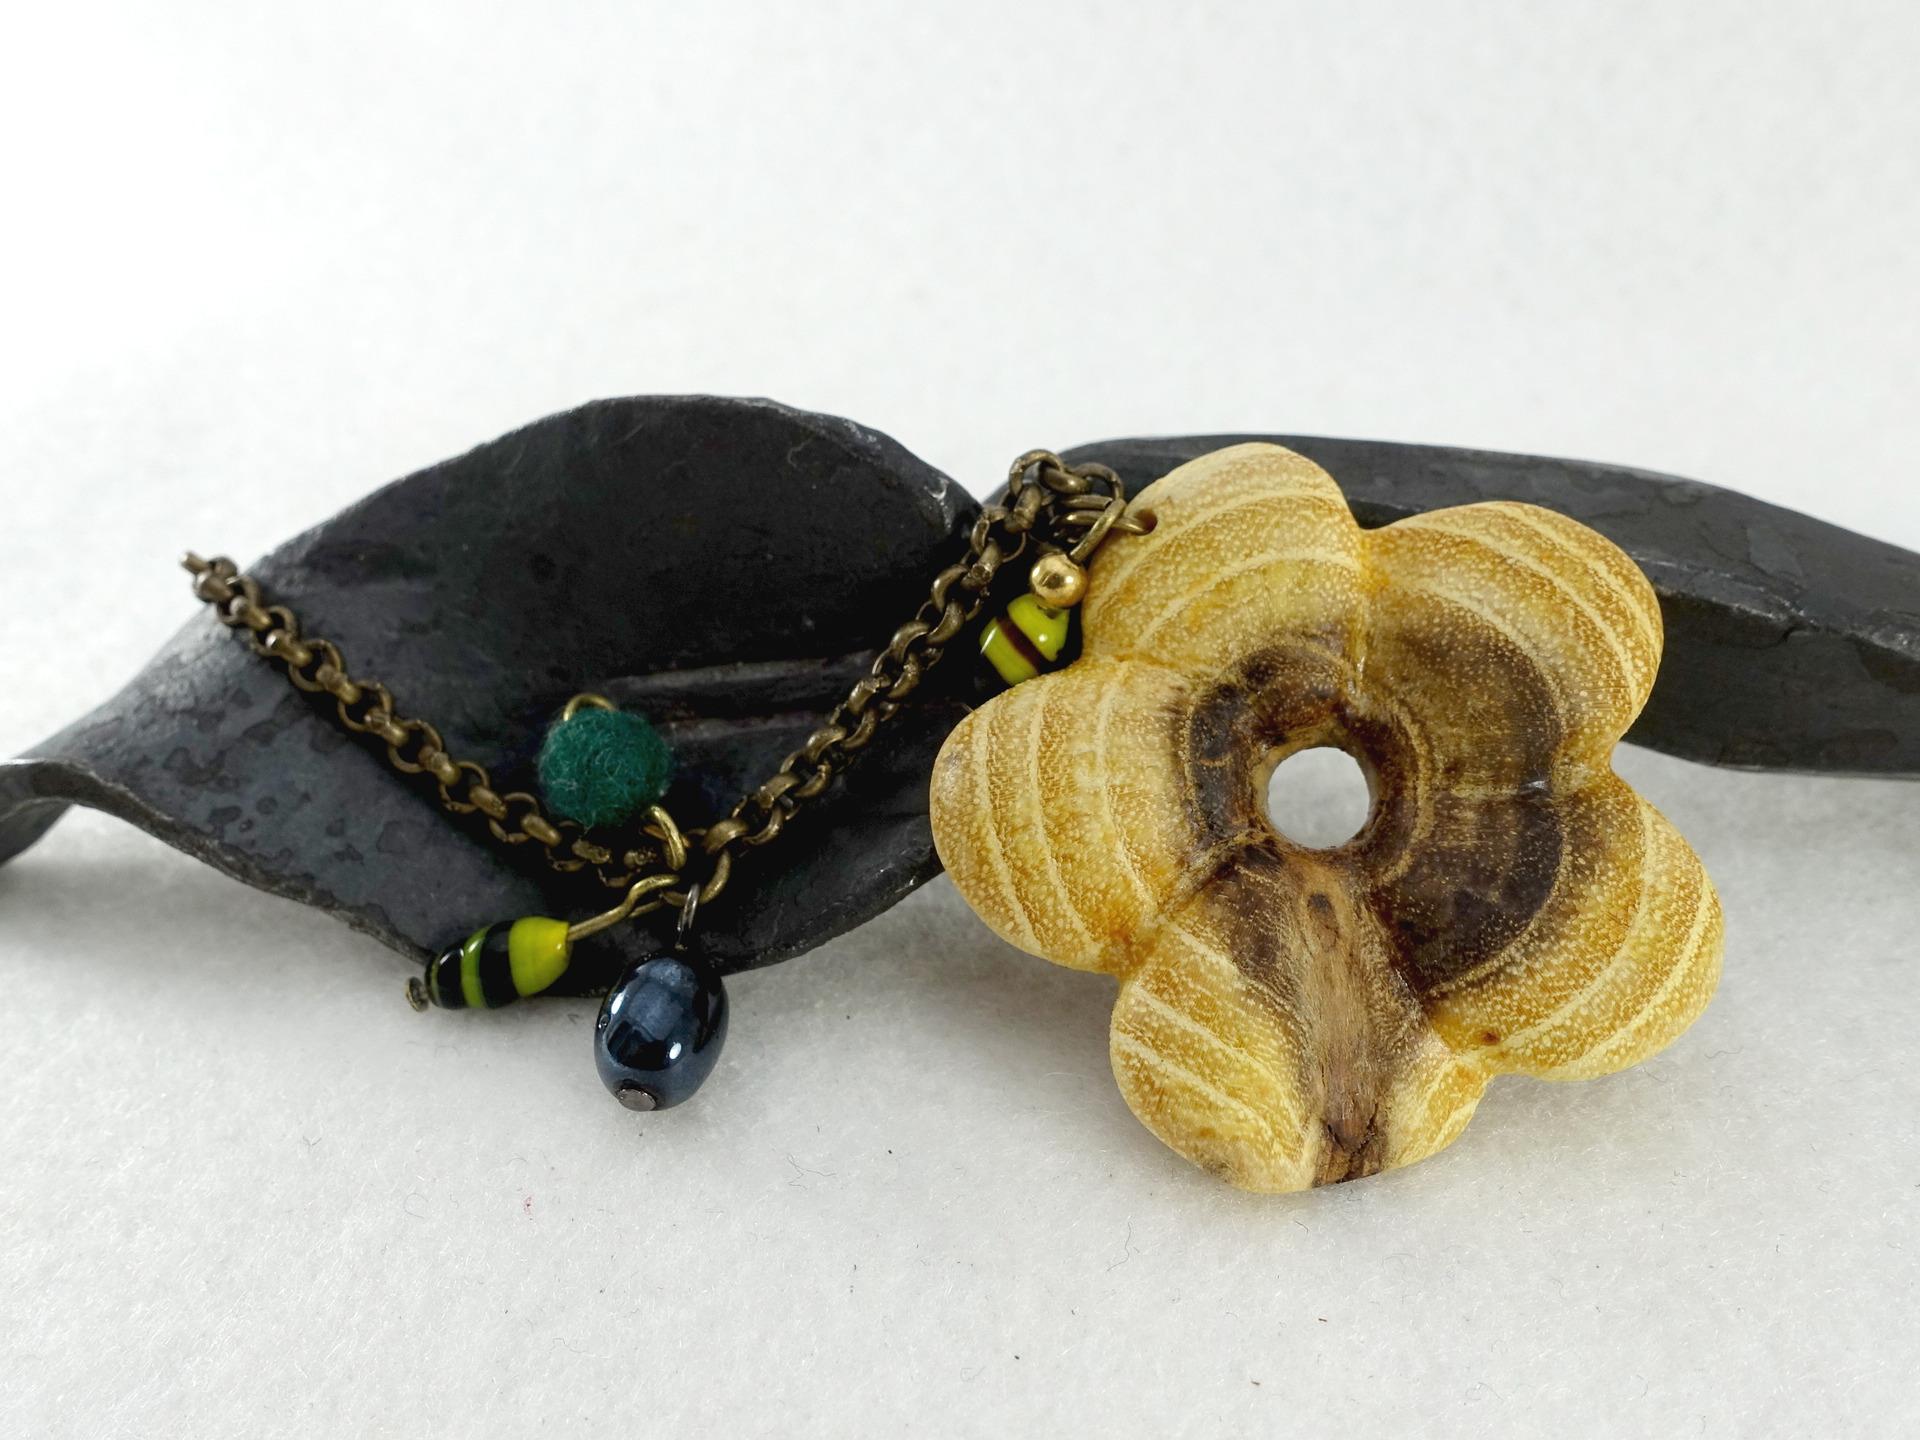 collier-sautoir-fleur-percee-en-bois-perl-17864582-sautoir-fleur-ra87c-6d527_big